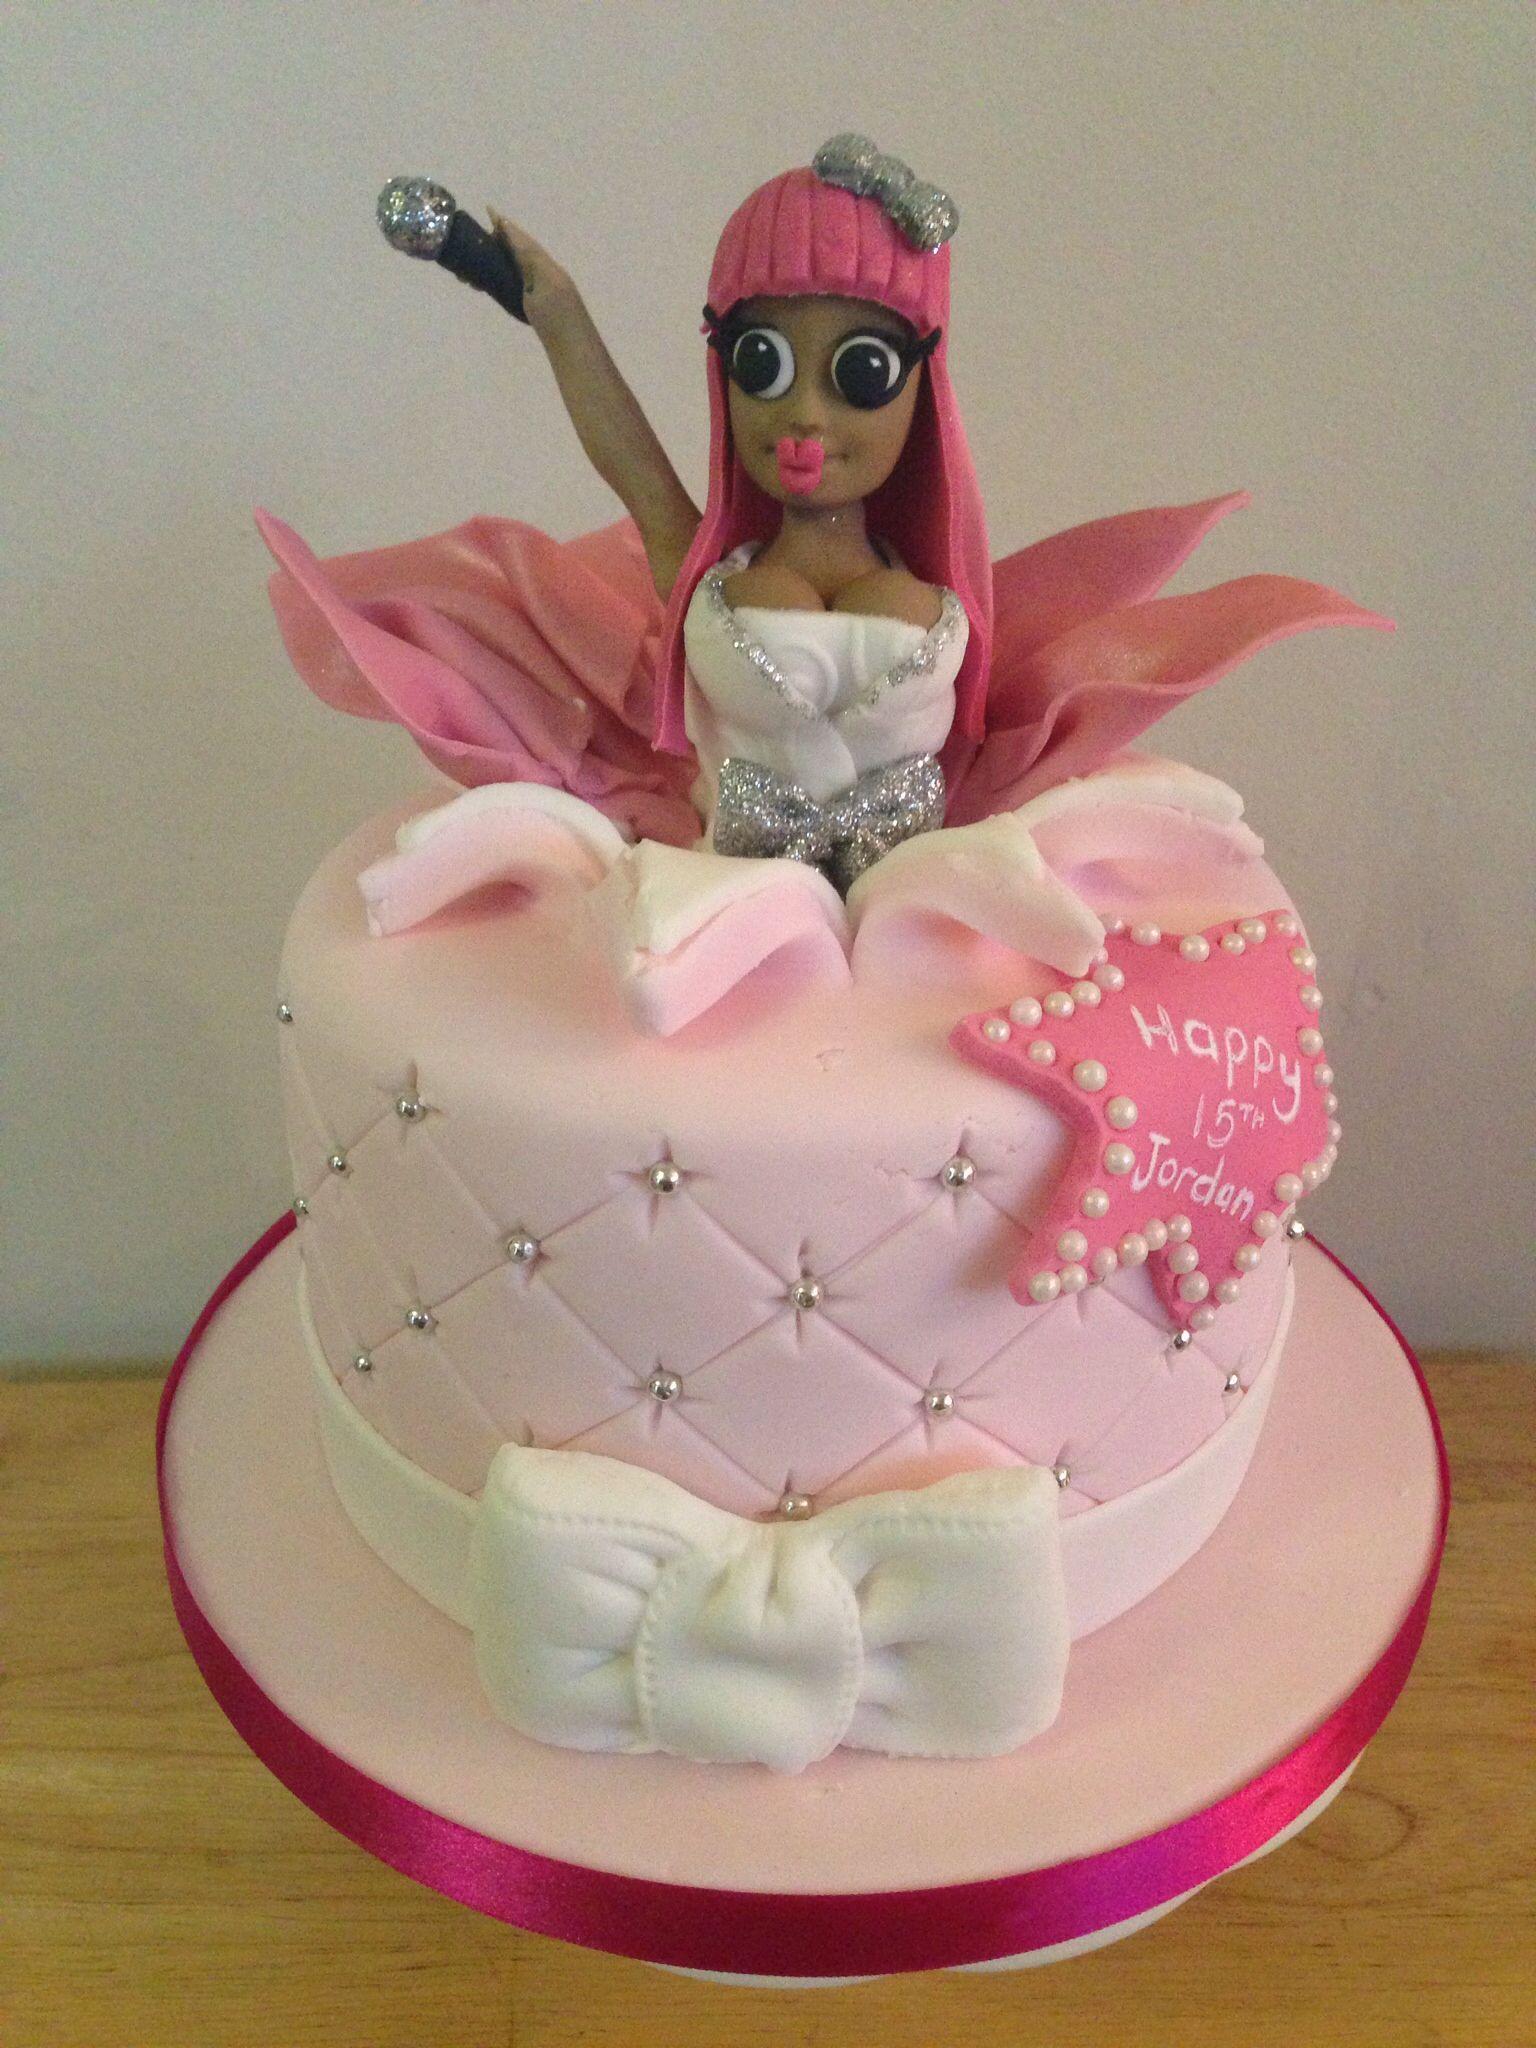 Enjoyable Nicki Minaj Cake Character Cakes Cake Girl Cake Personalised Birthday Cards Paralily Jamesorg